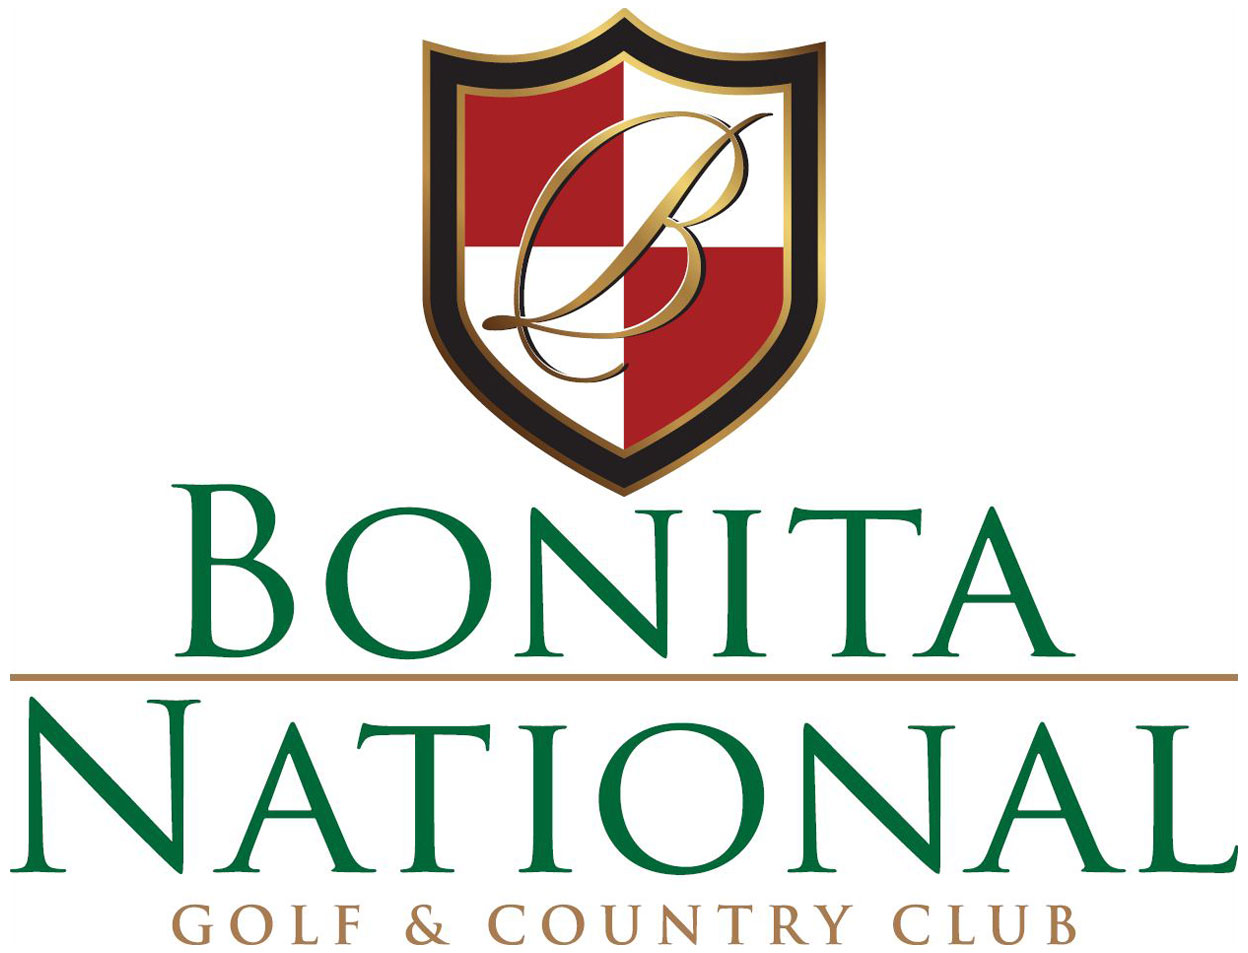 Bonita National